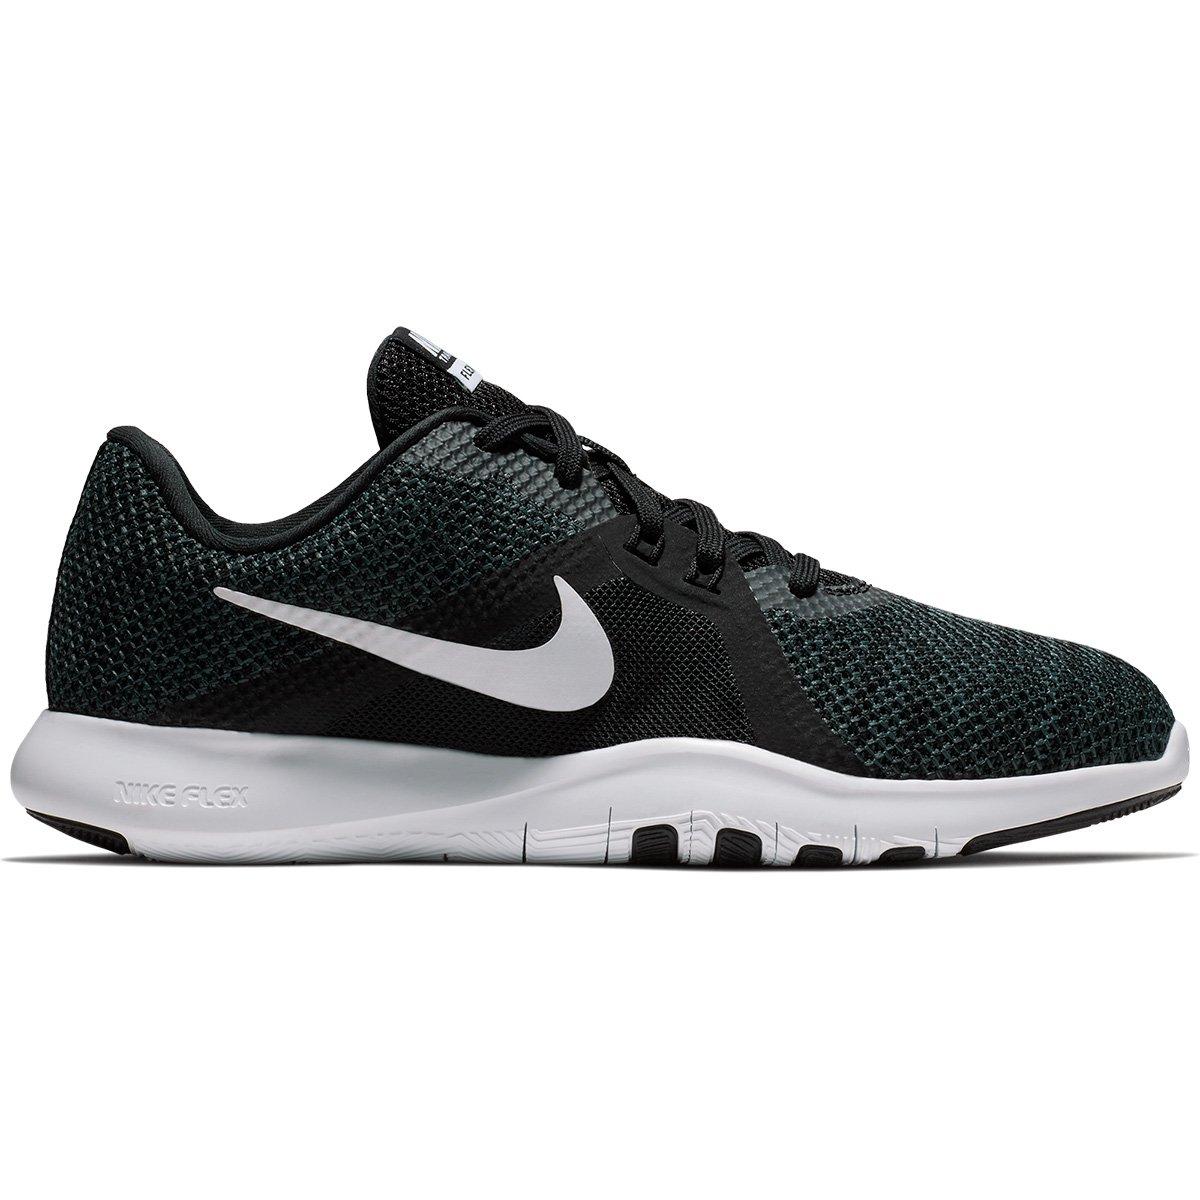 Tênis Nike Flex Trainer 8 Feminino - Preto e Branco | Loja do Inter